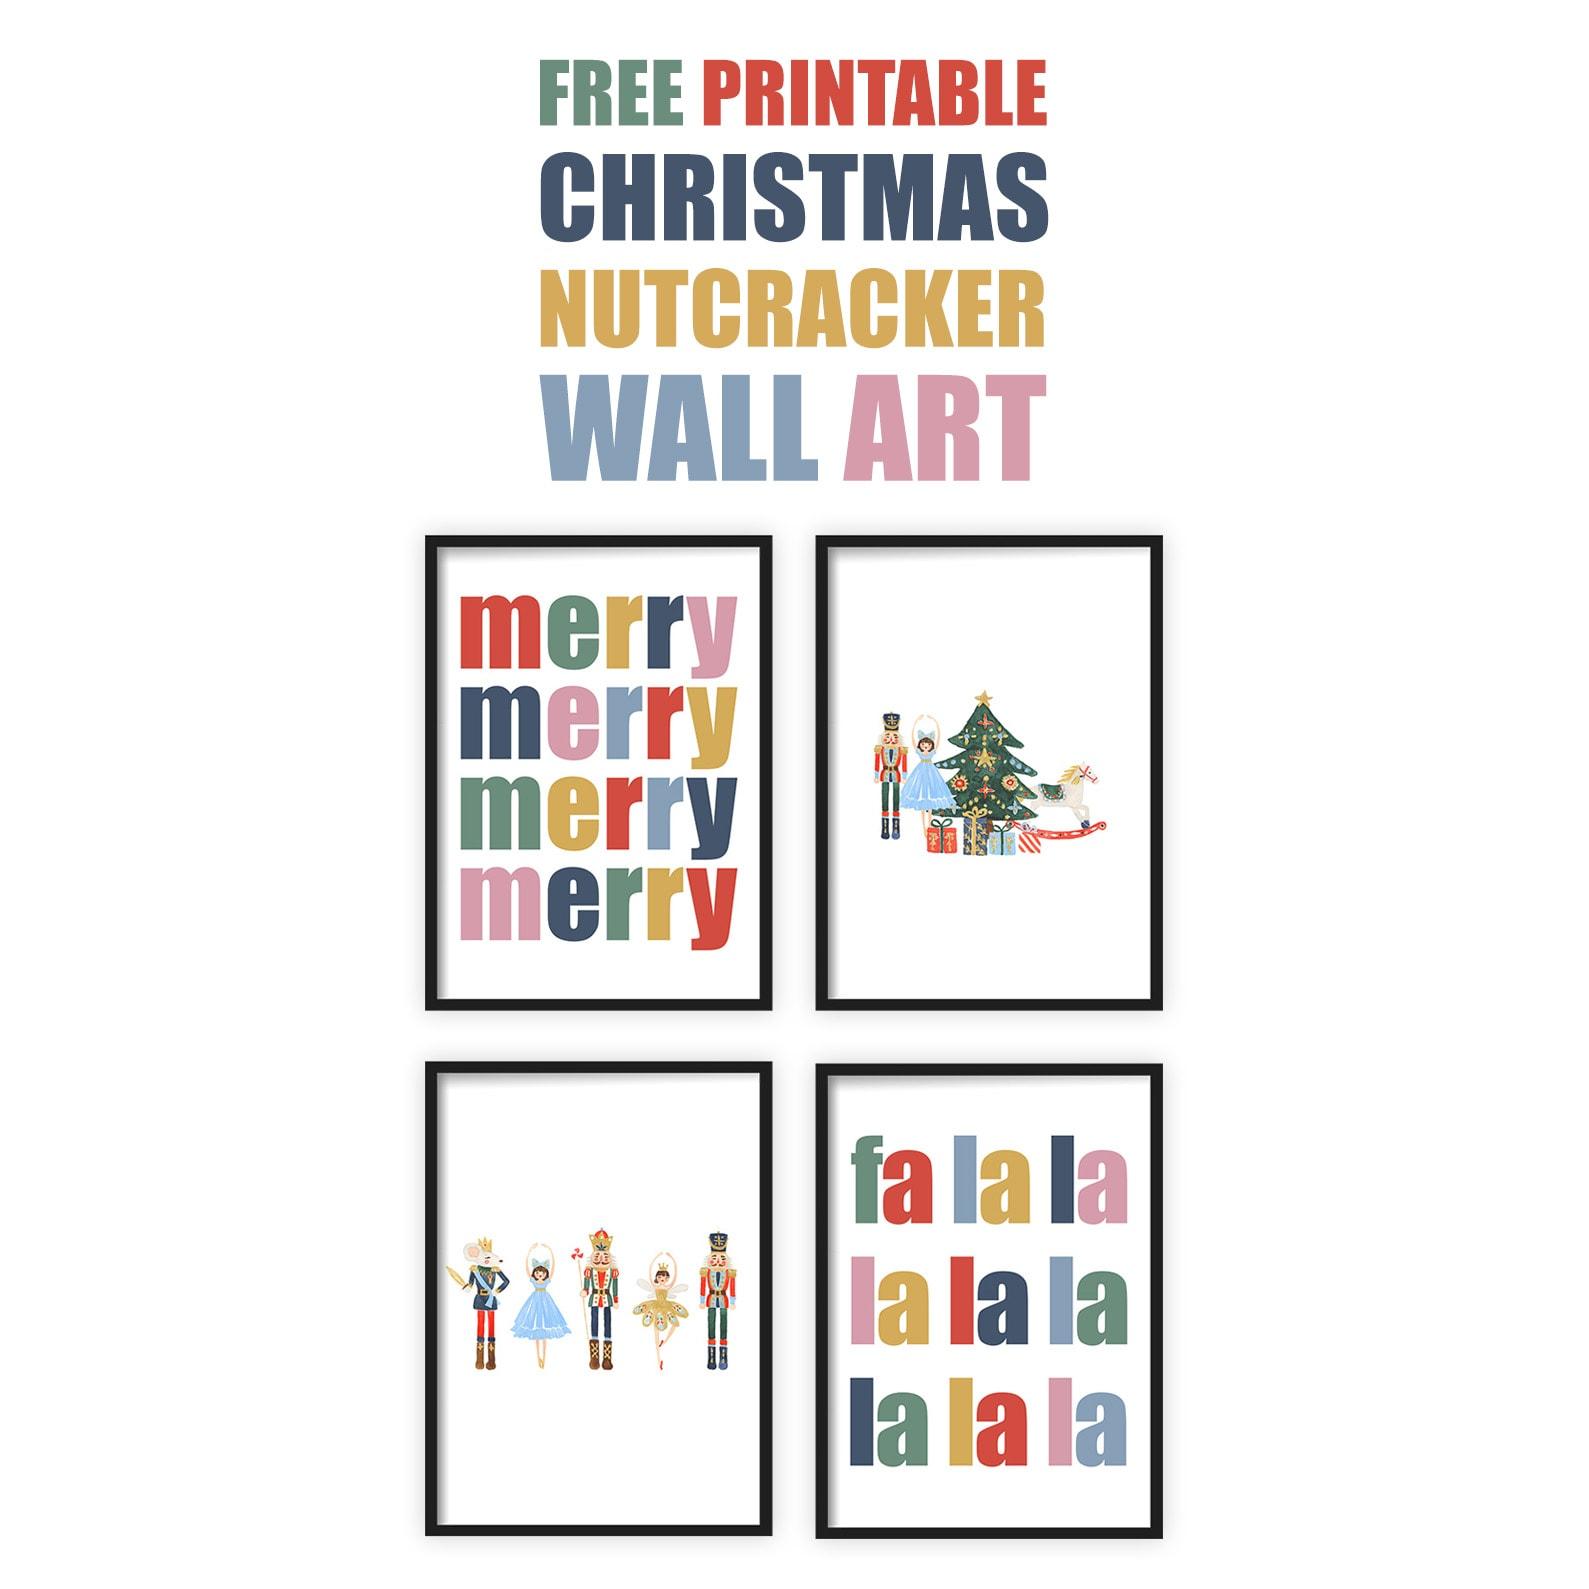 Free Printable Nutcracker Wall Art The Cottage Market